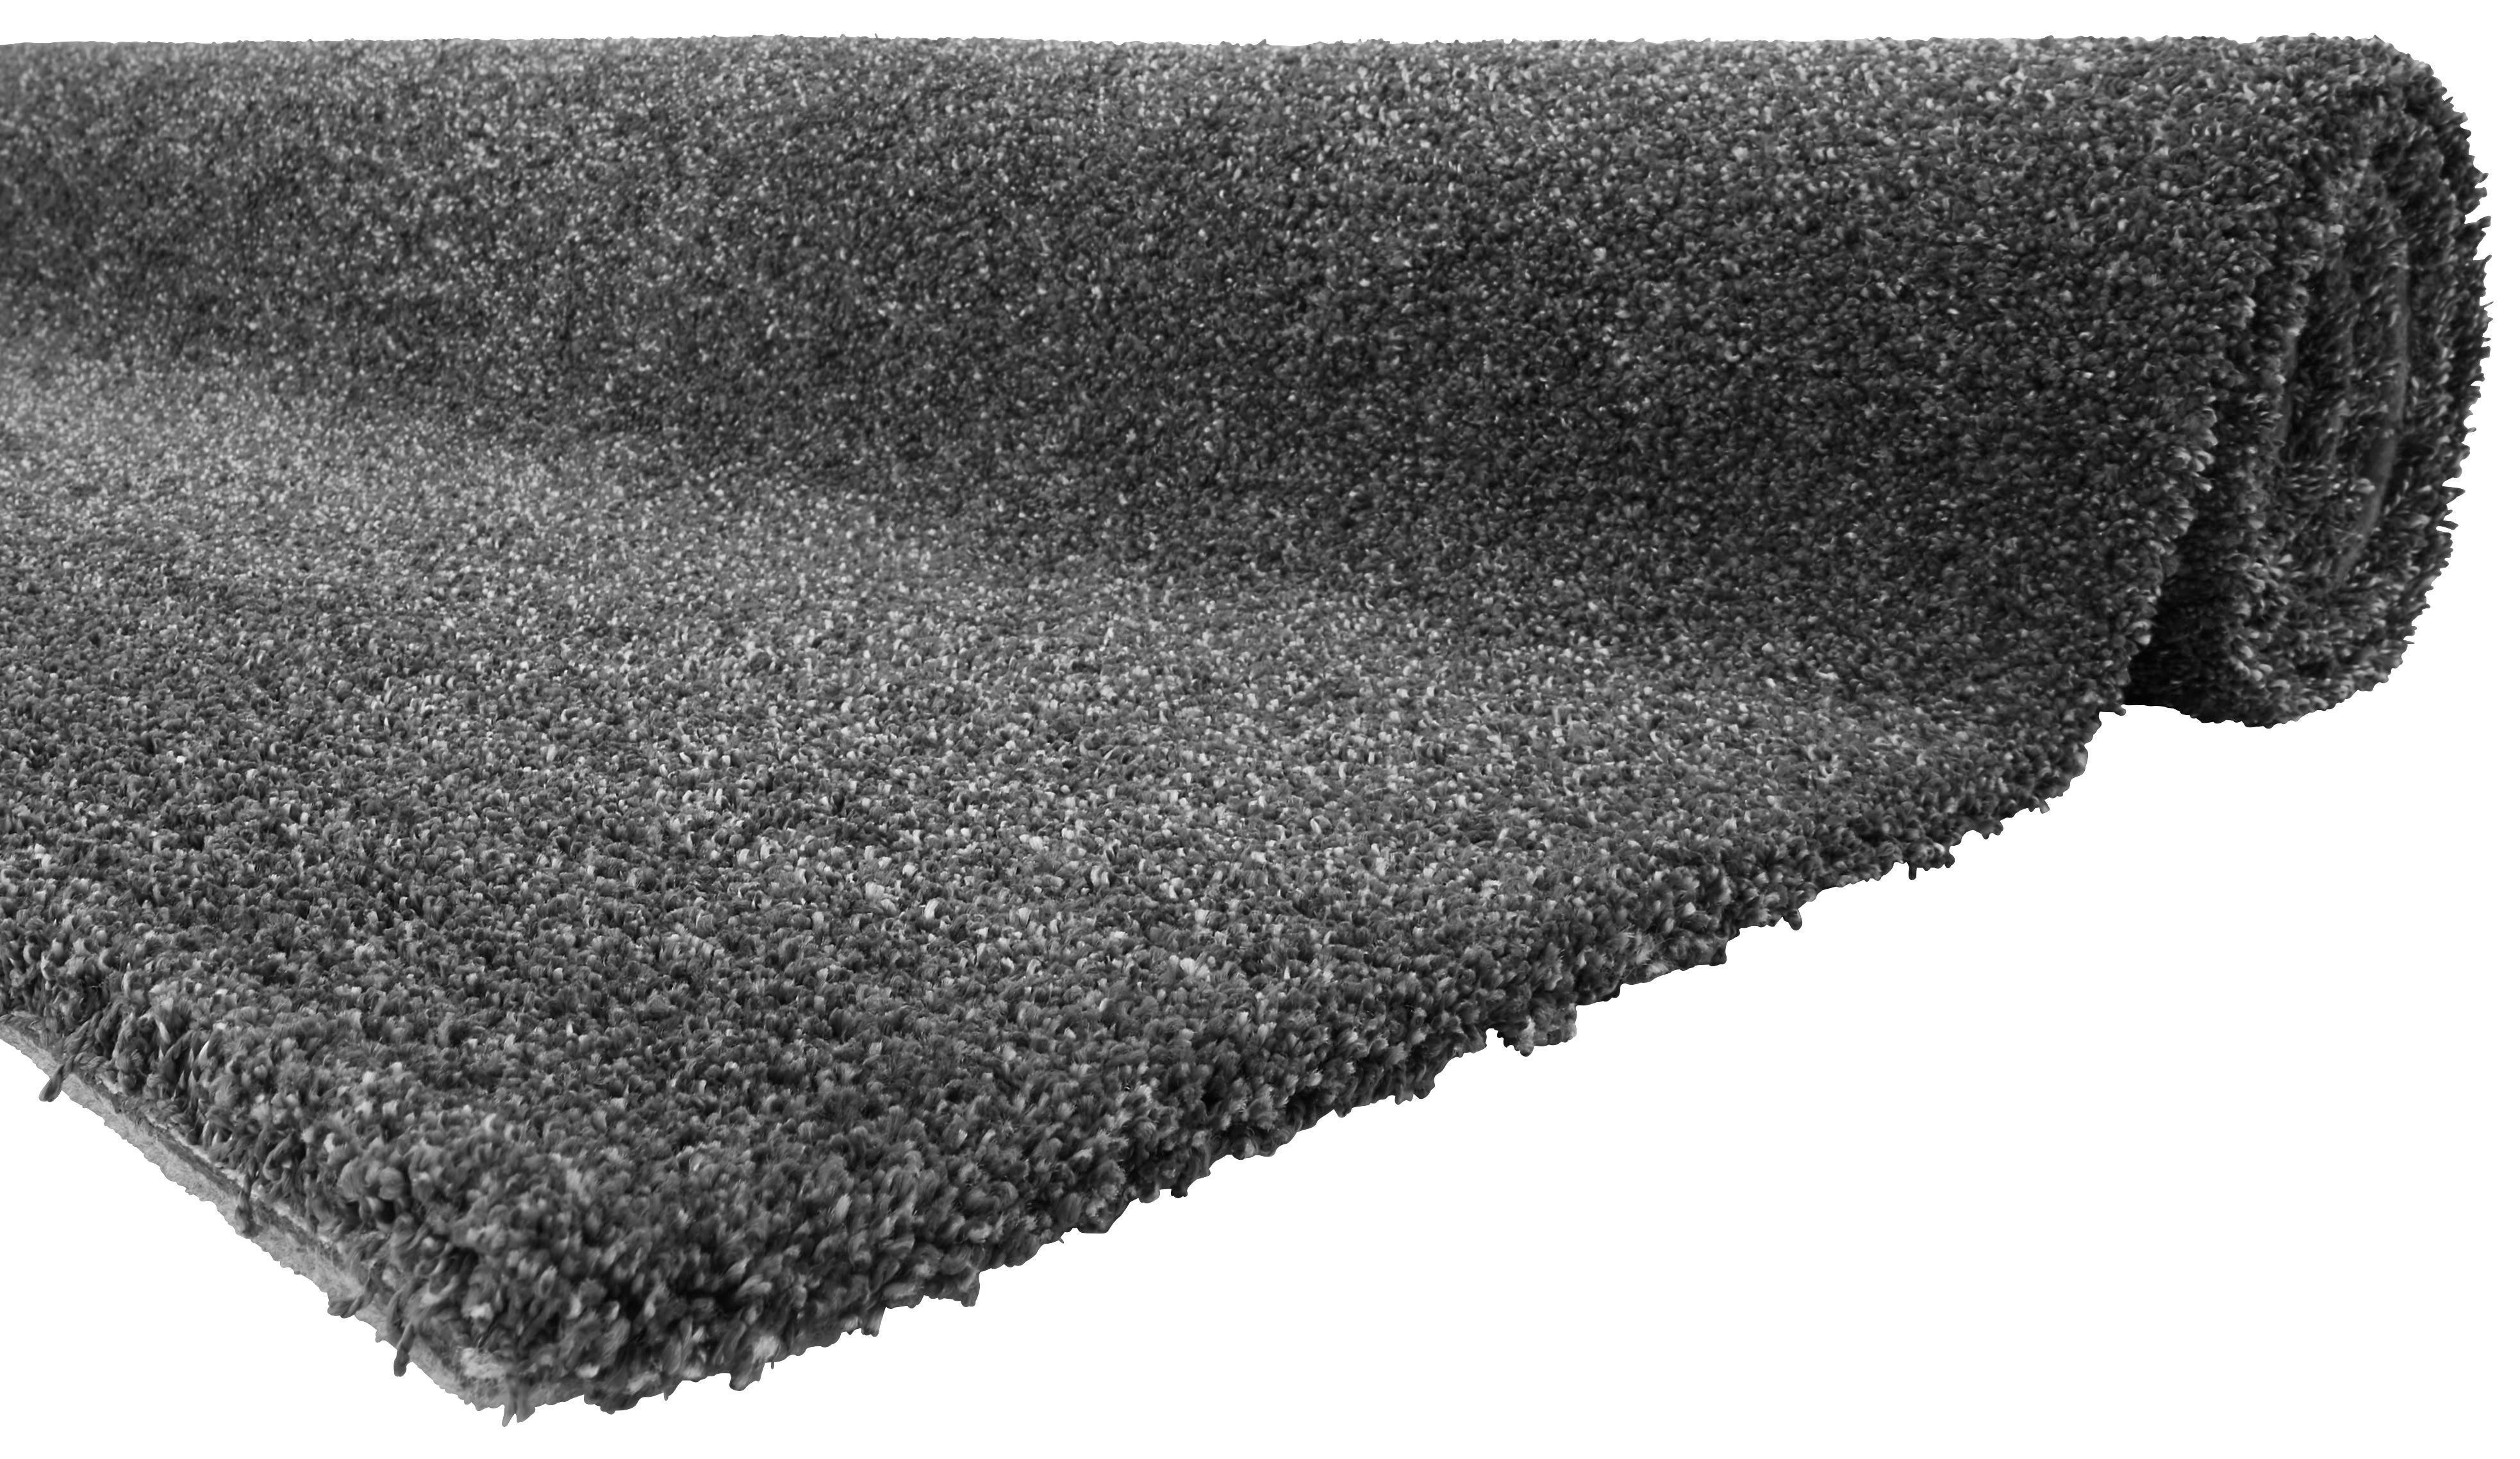 Tuftteppich Sevillia - Grau (80/150cm) - MÖMAX modern living